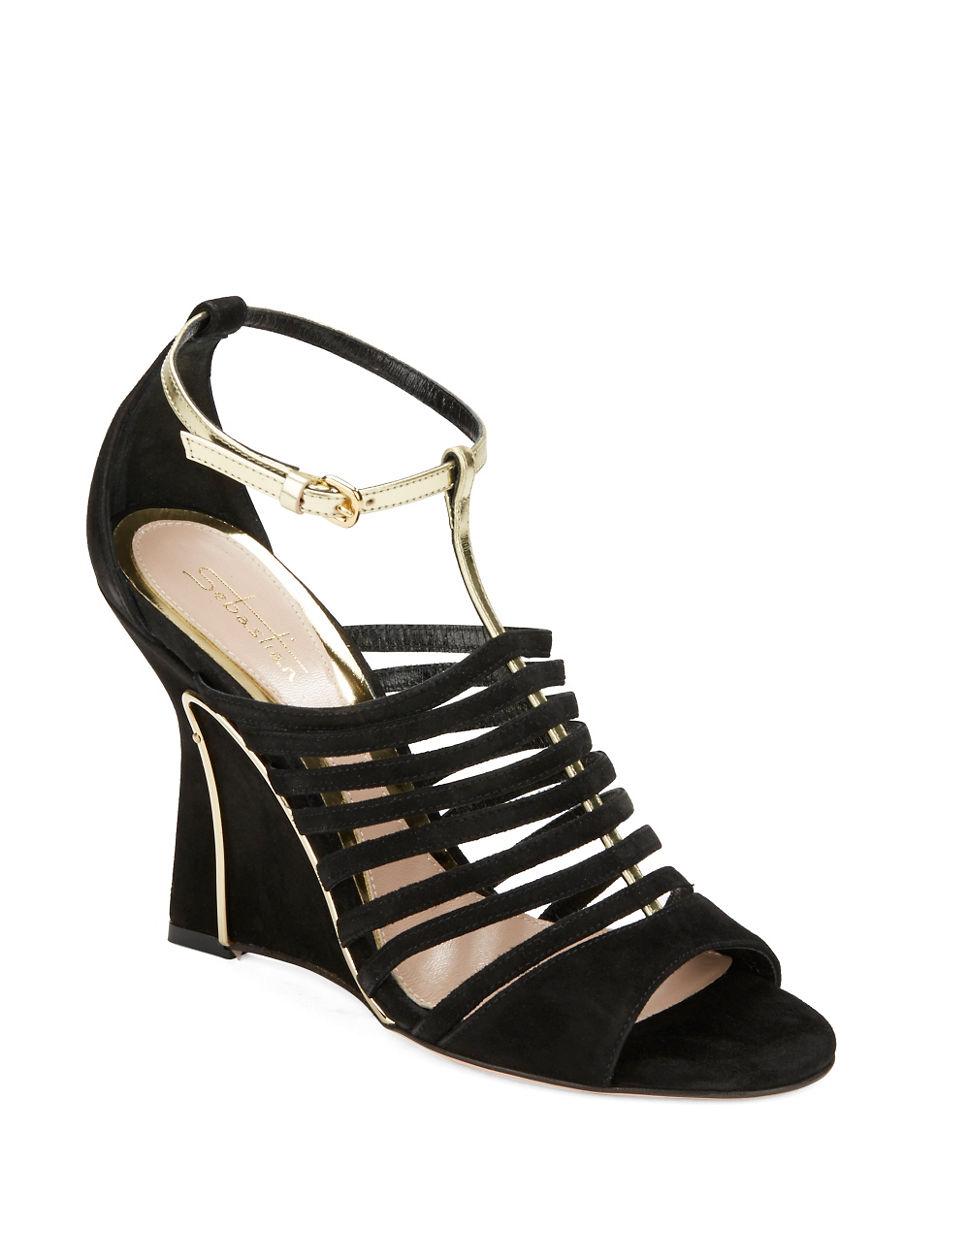 sebastian suede open toe wedge sandals in black lyst